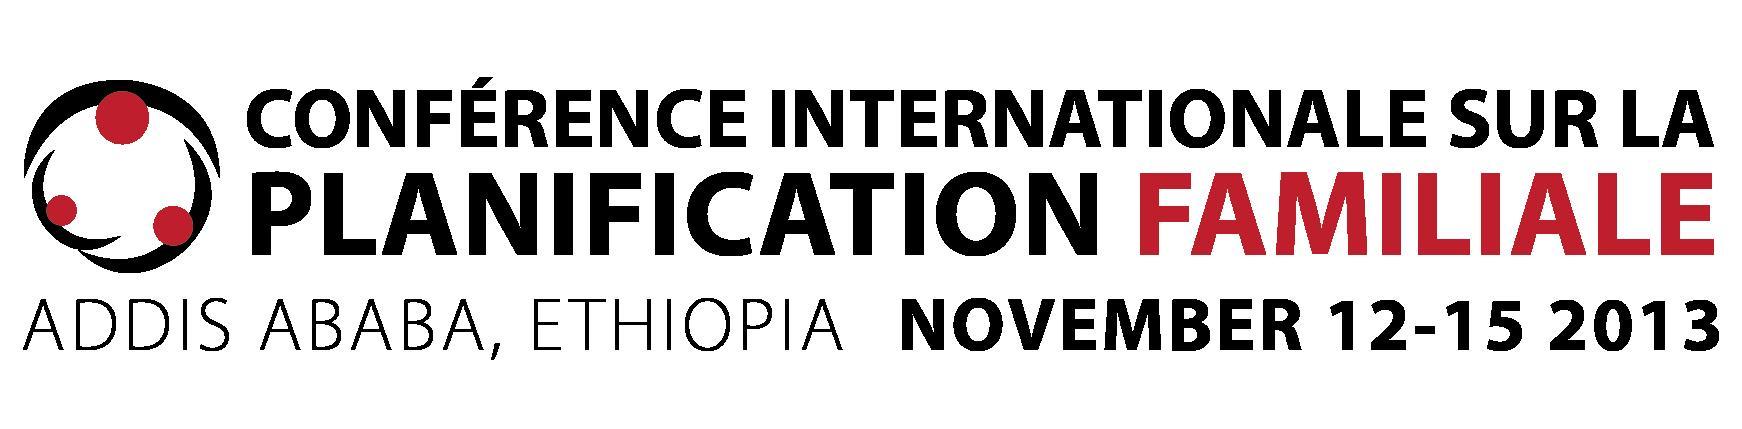 ICFP 2013 French logo